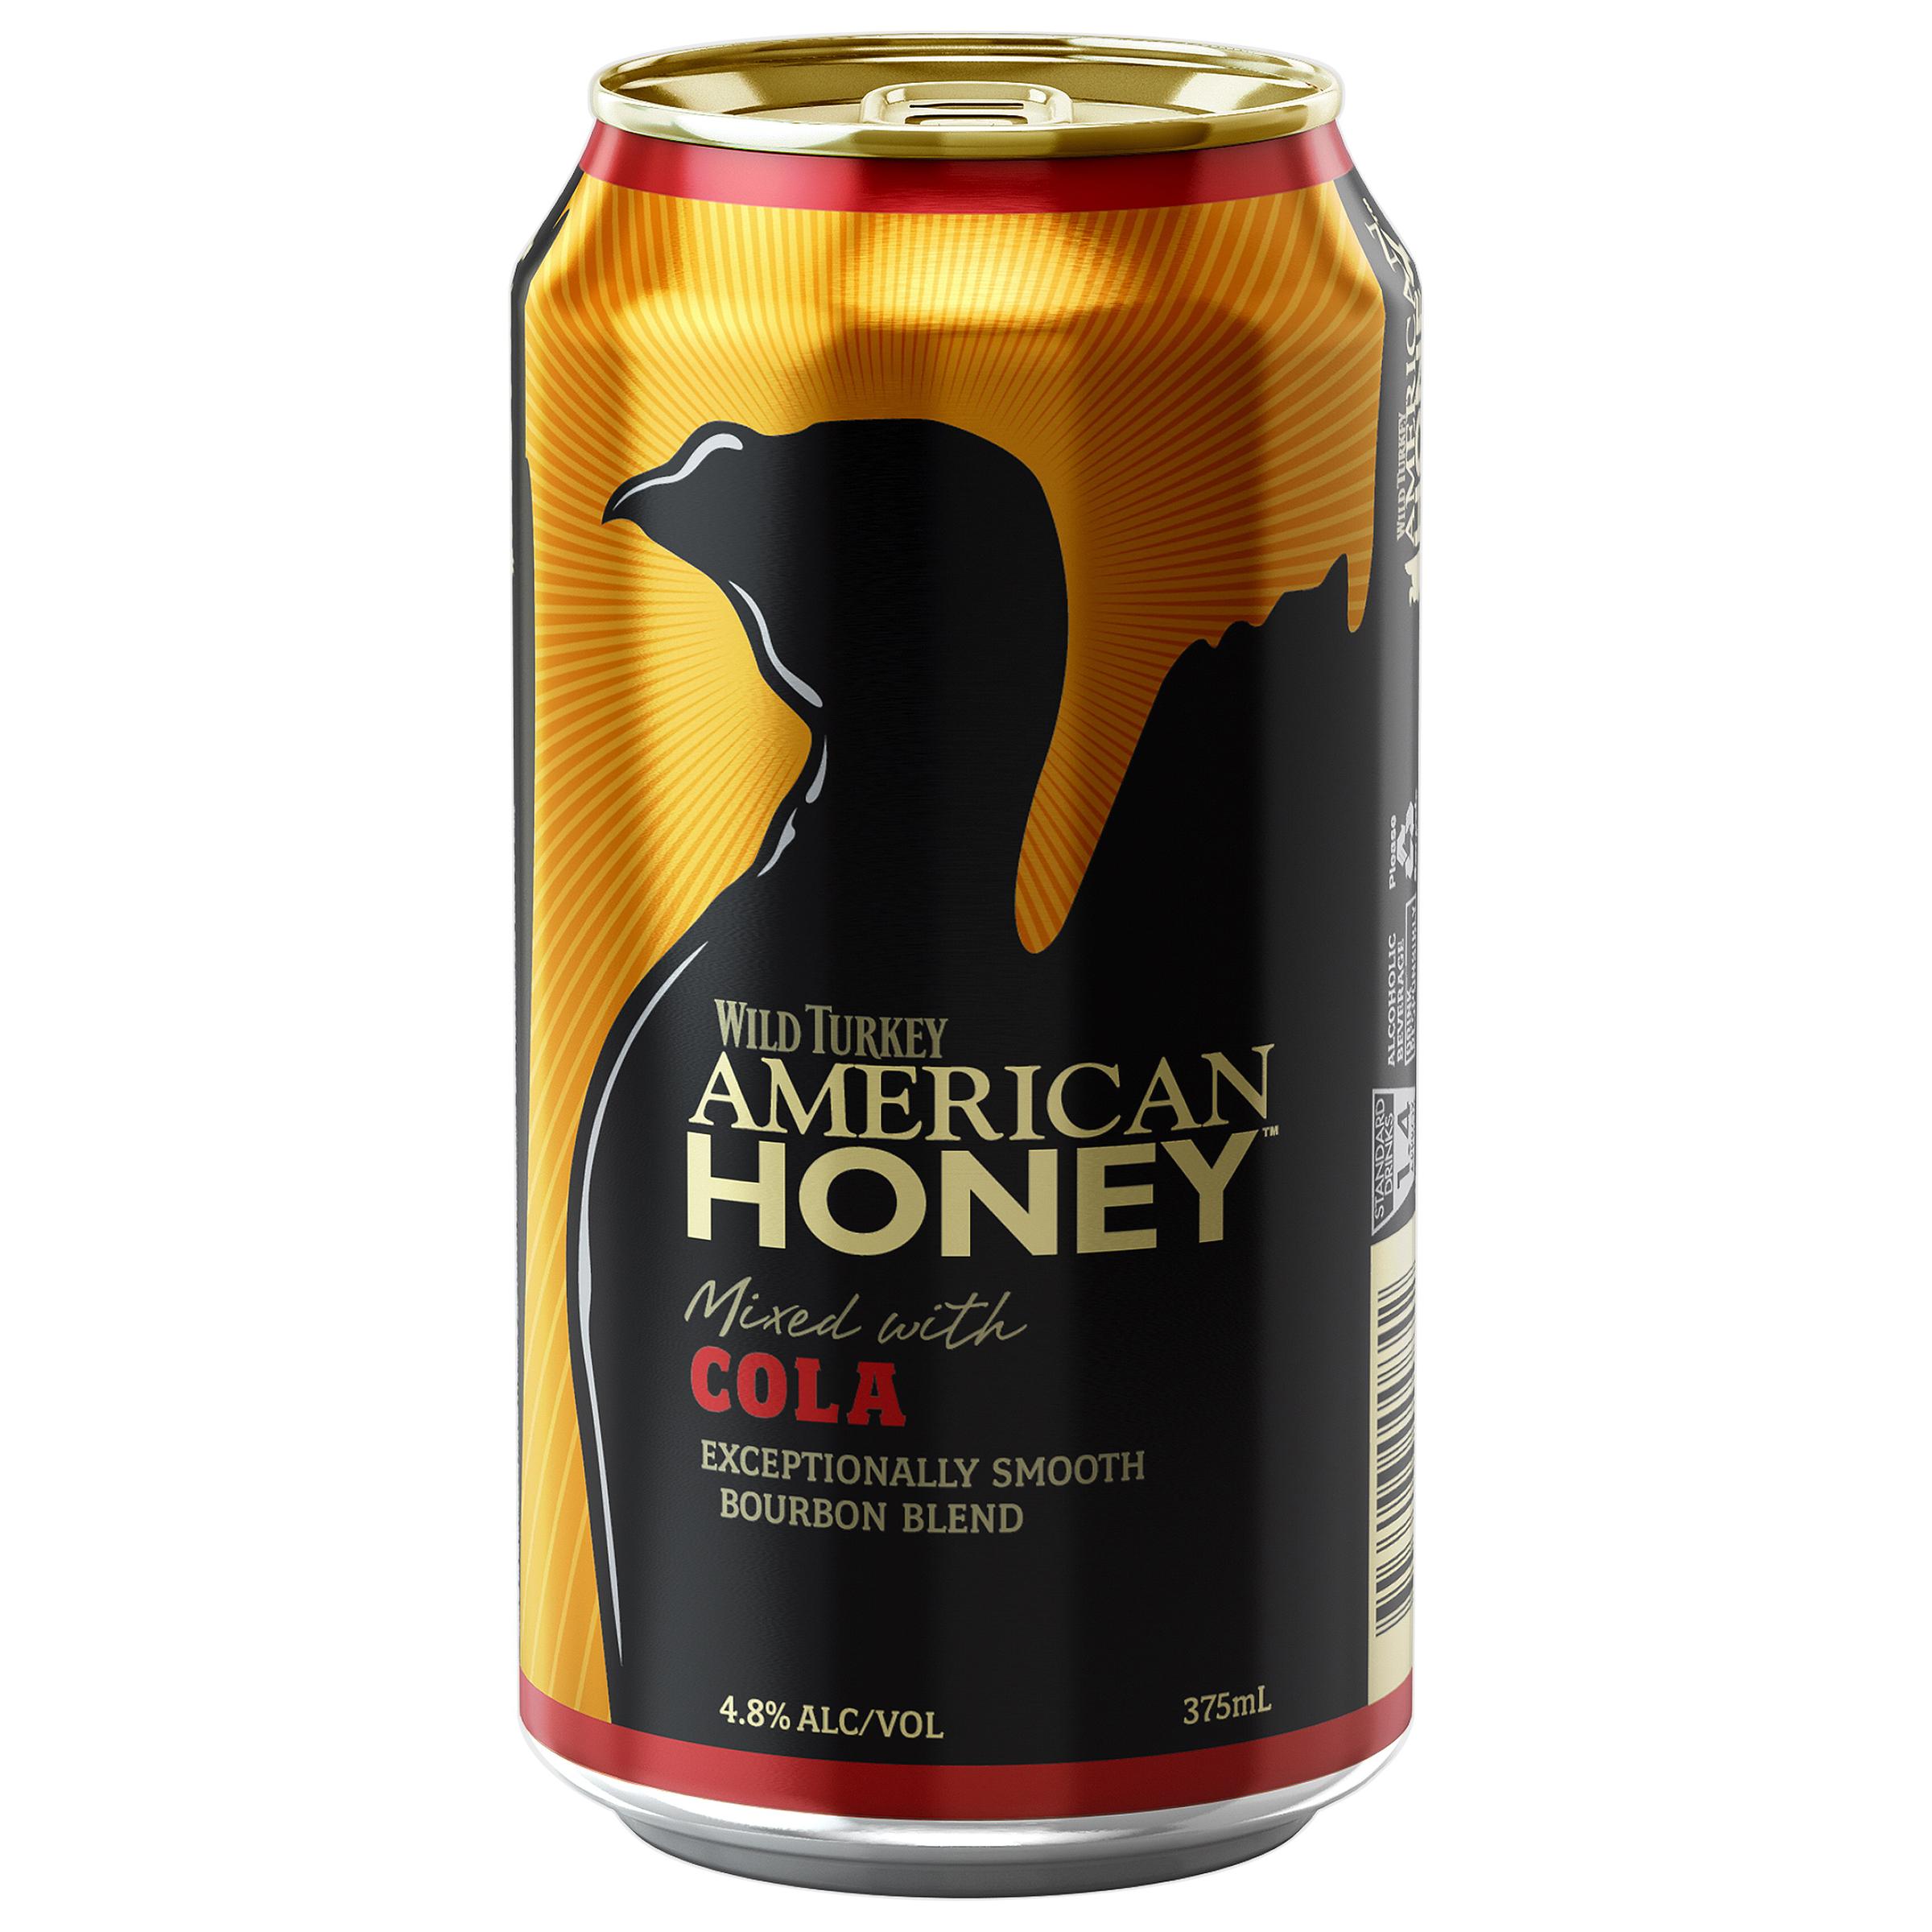 WILD TURKEY AMERICAN HONEY LIQUEUR & COLA CANS